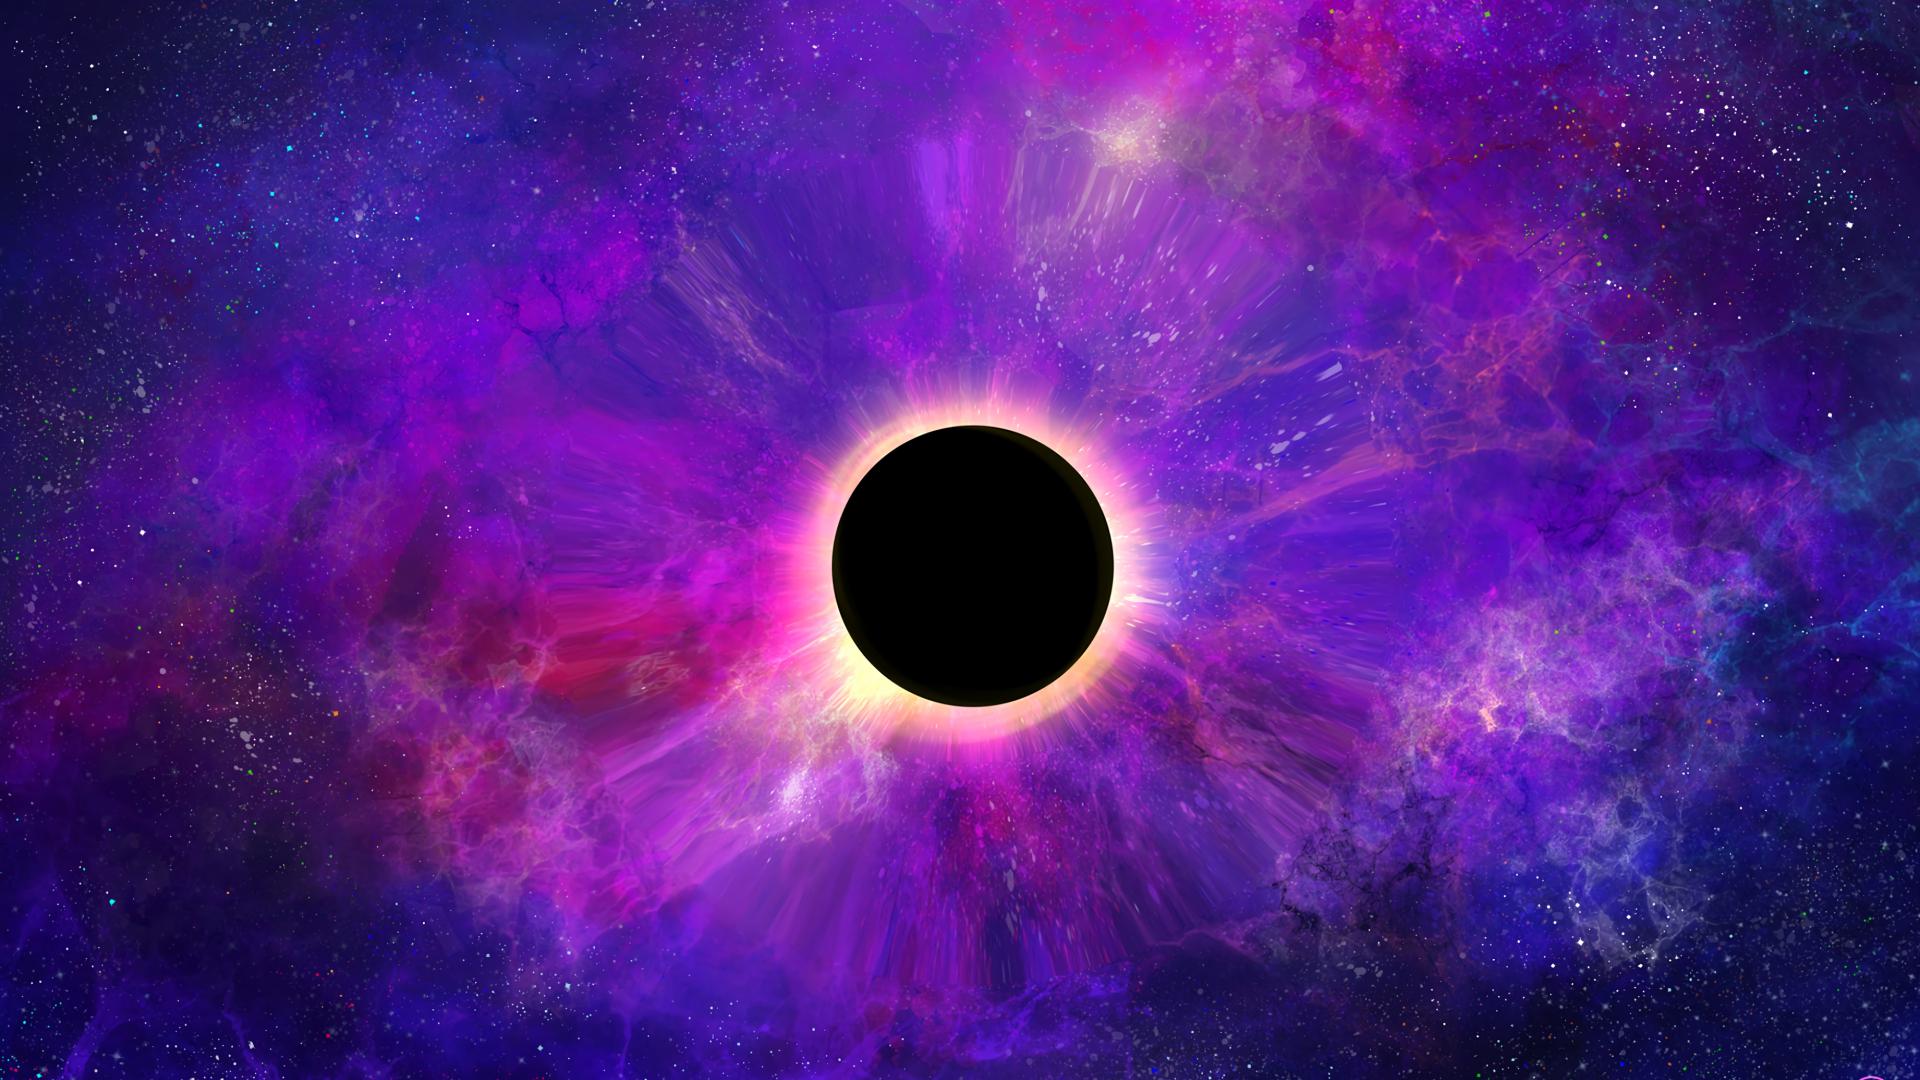 Download 1920x1080 Wallpaper Space Colorful Dark Black